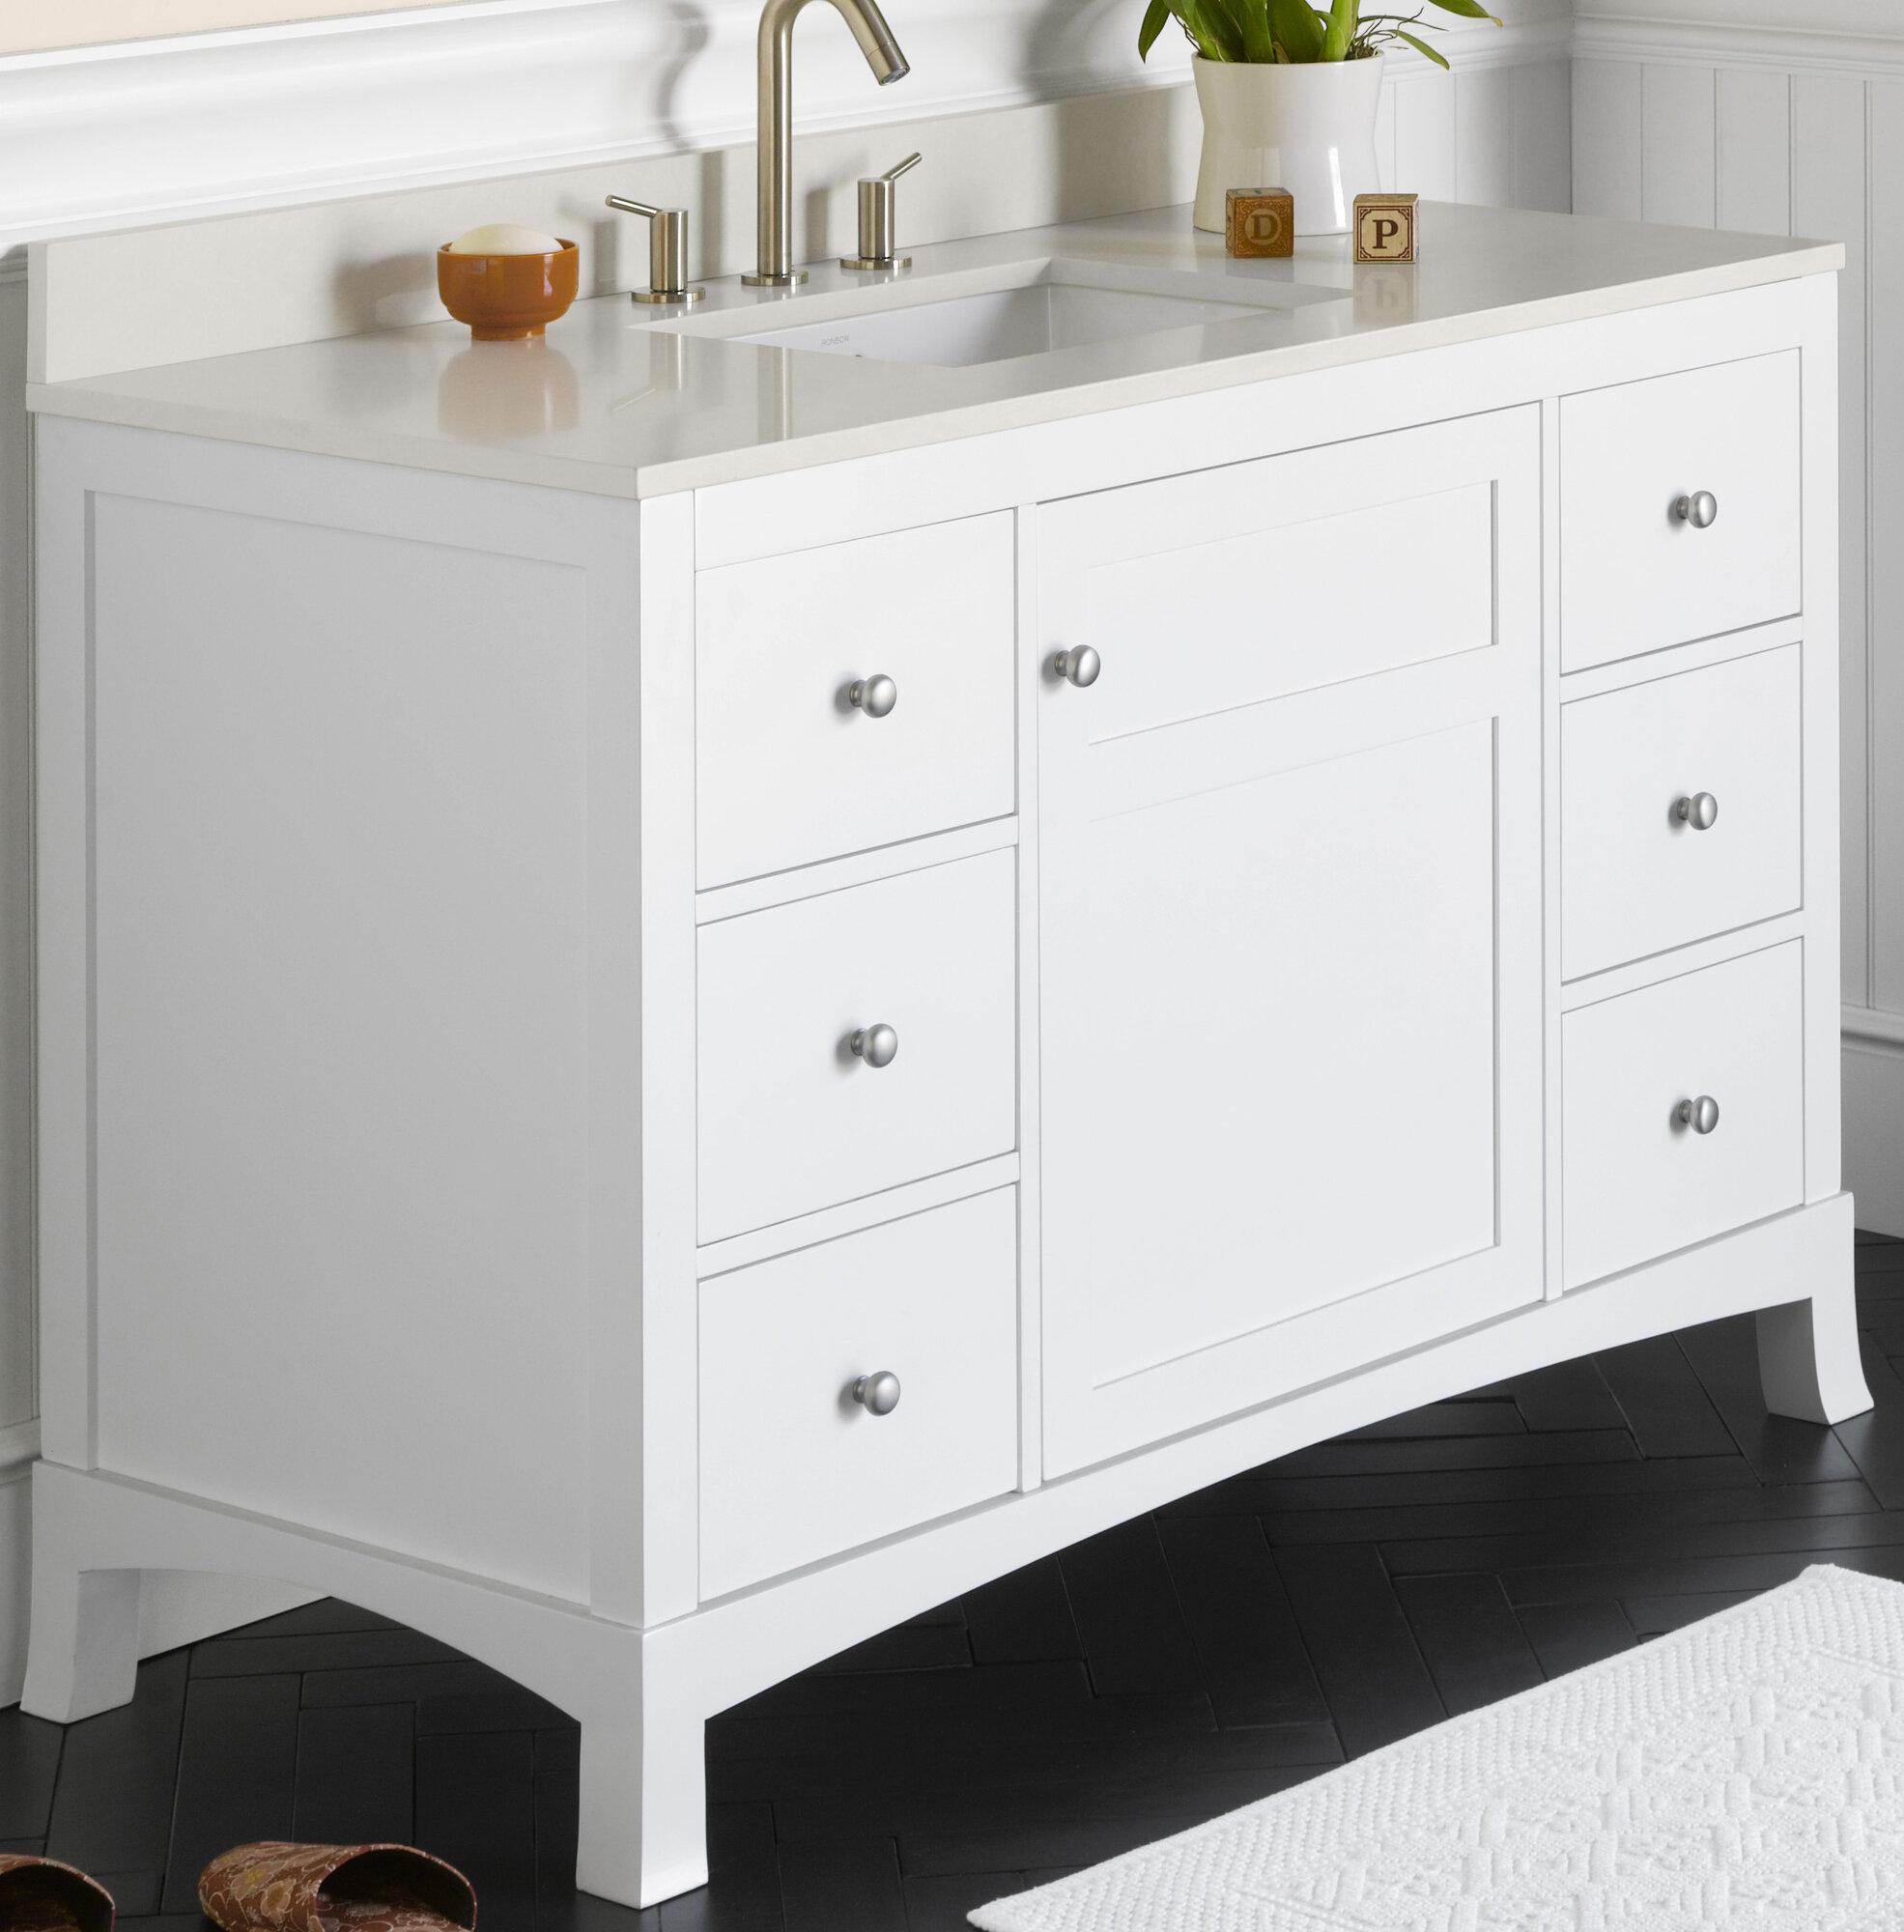 Ronbow hampton 48 bathroom vanity cabinet base in white for 48 inch bathroom vanity base